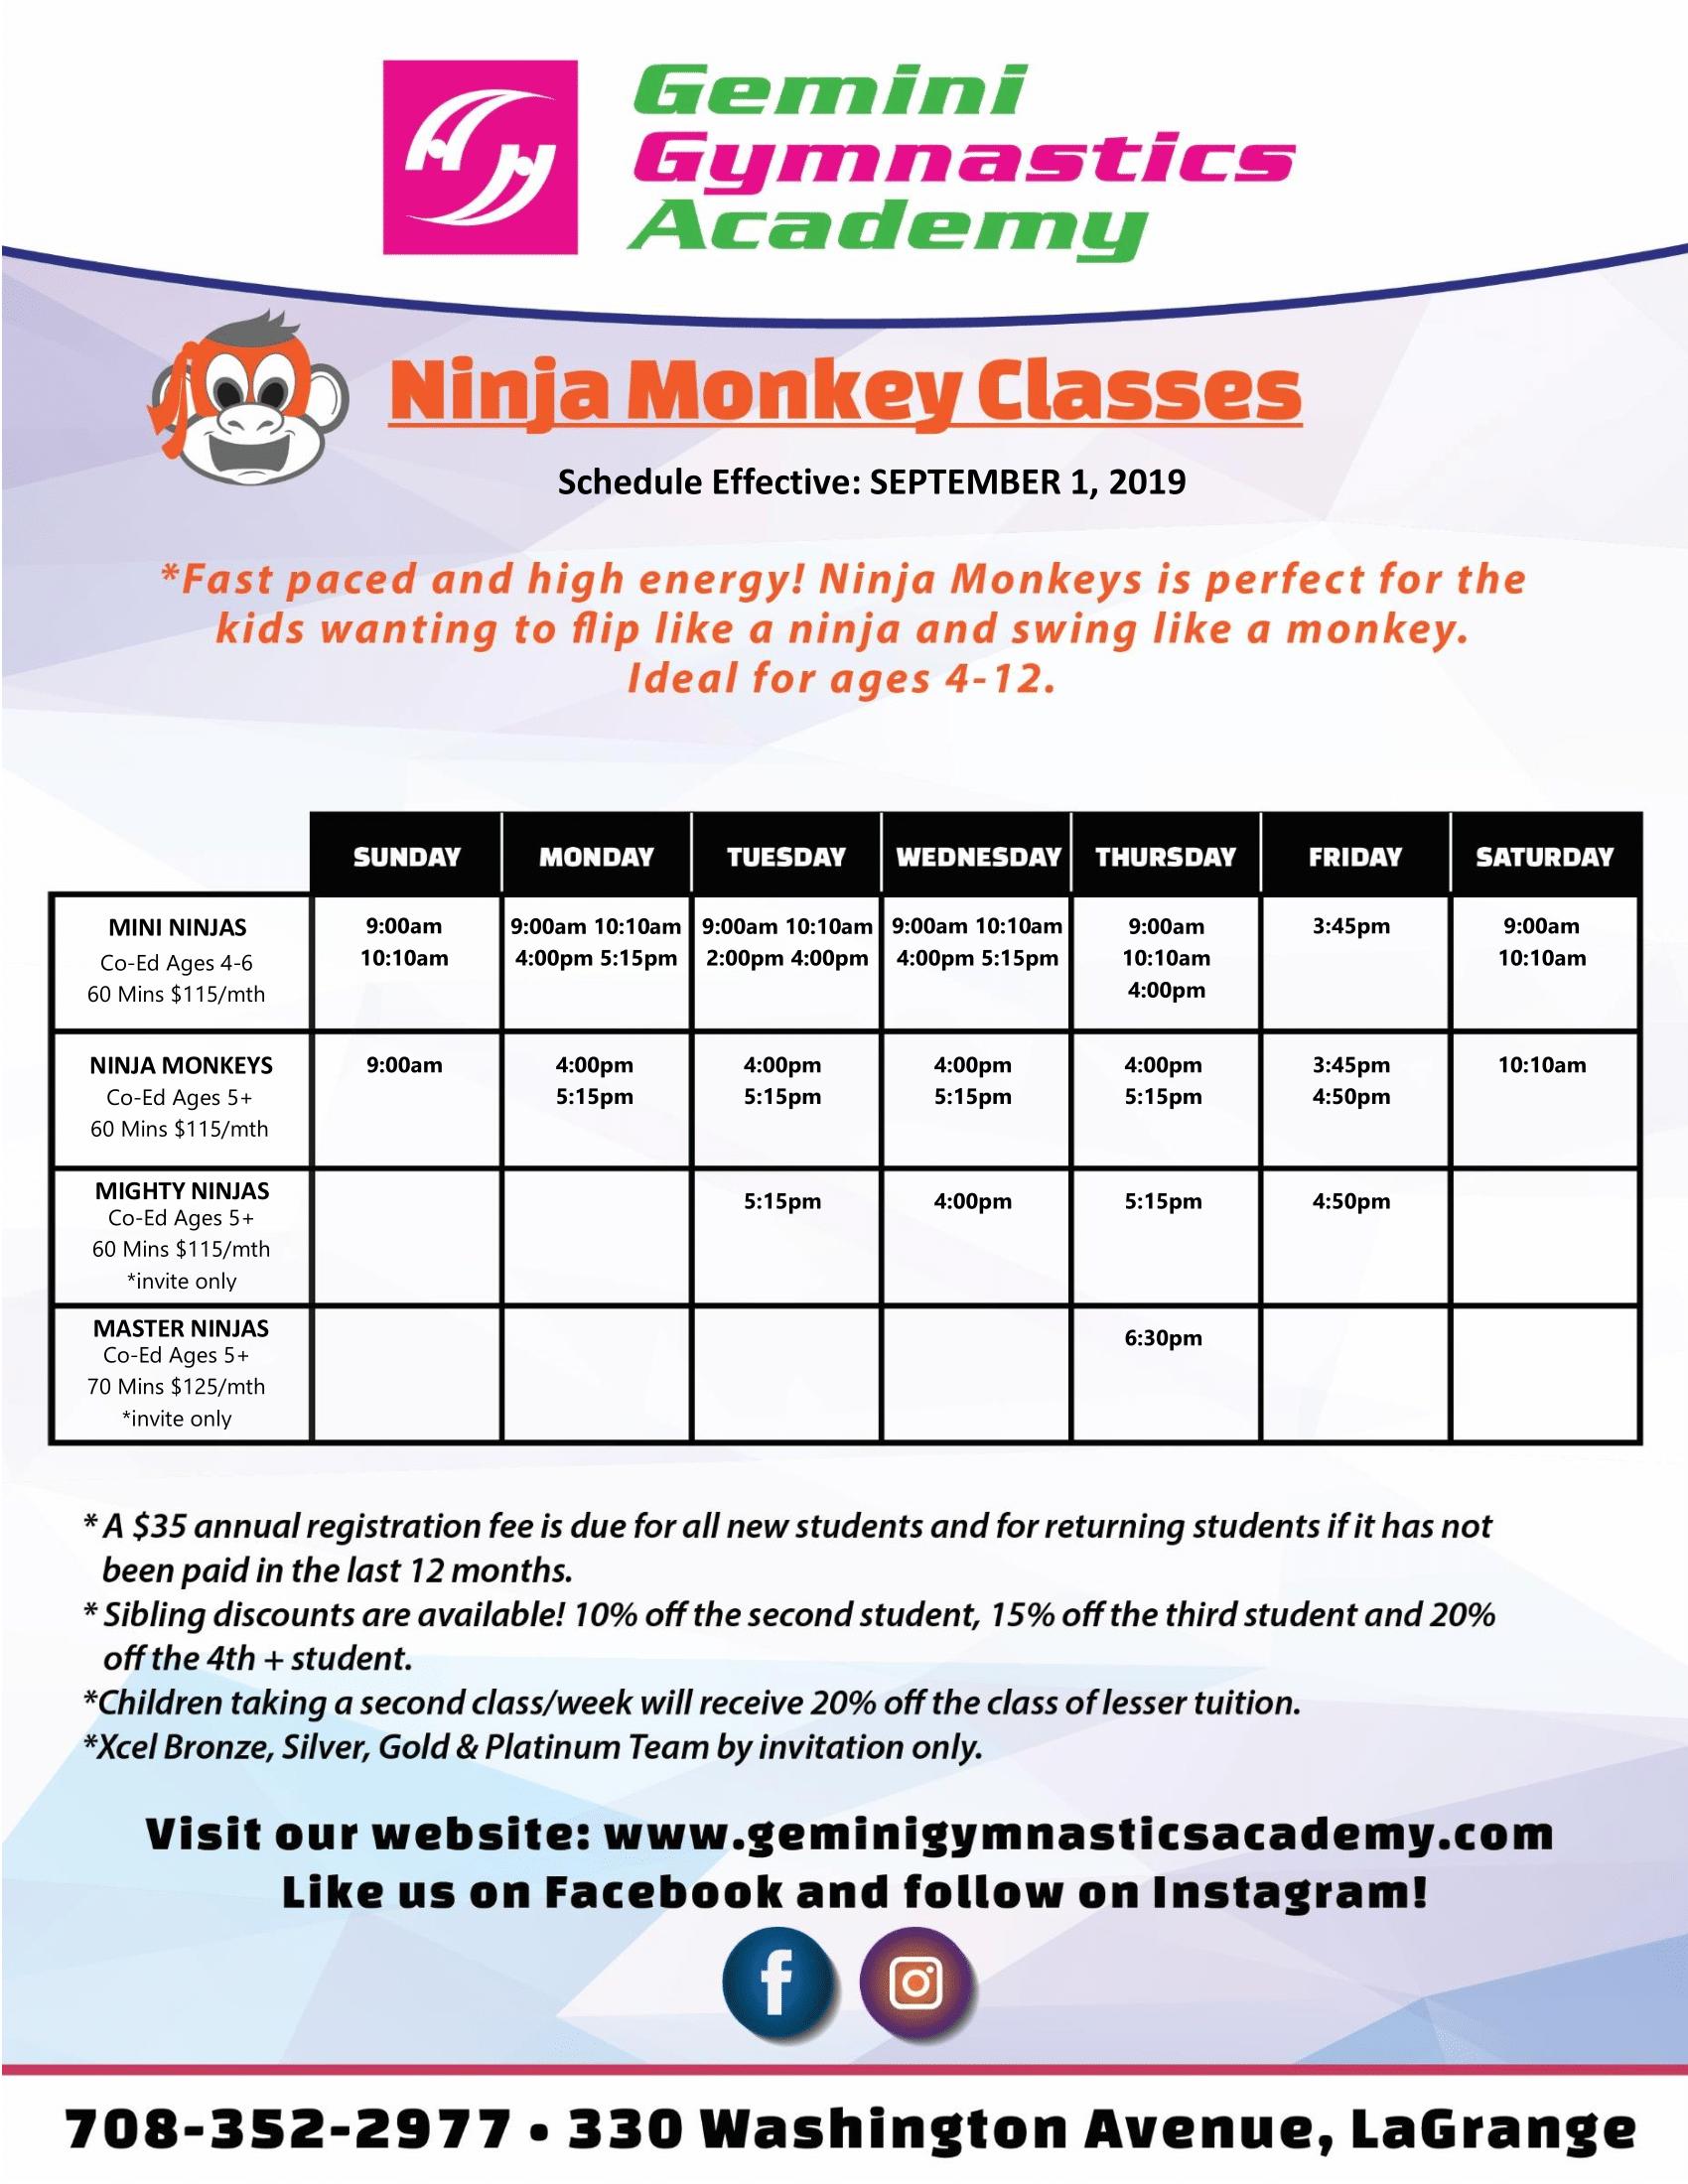 9_2019Gemini Gymnastics_Ninja Monkeys_Schedule_-1